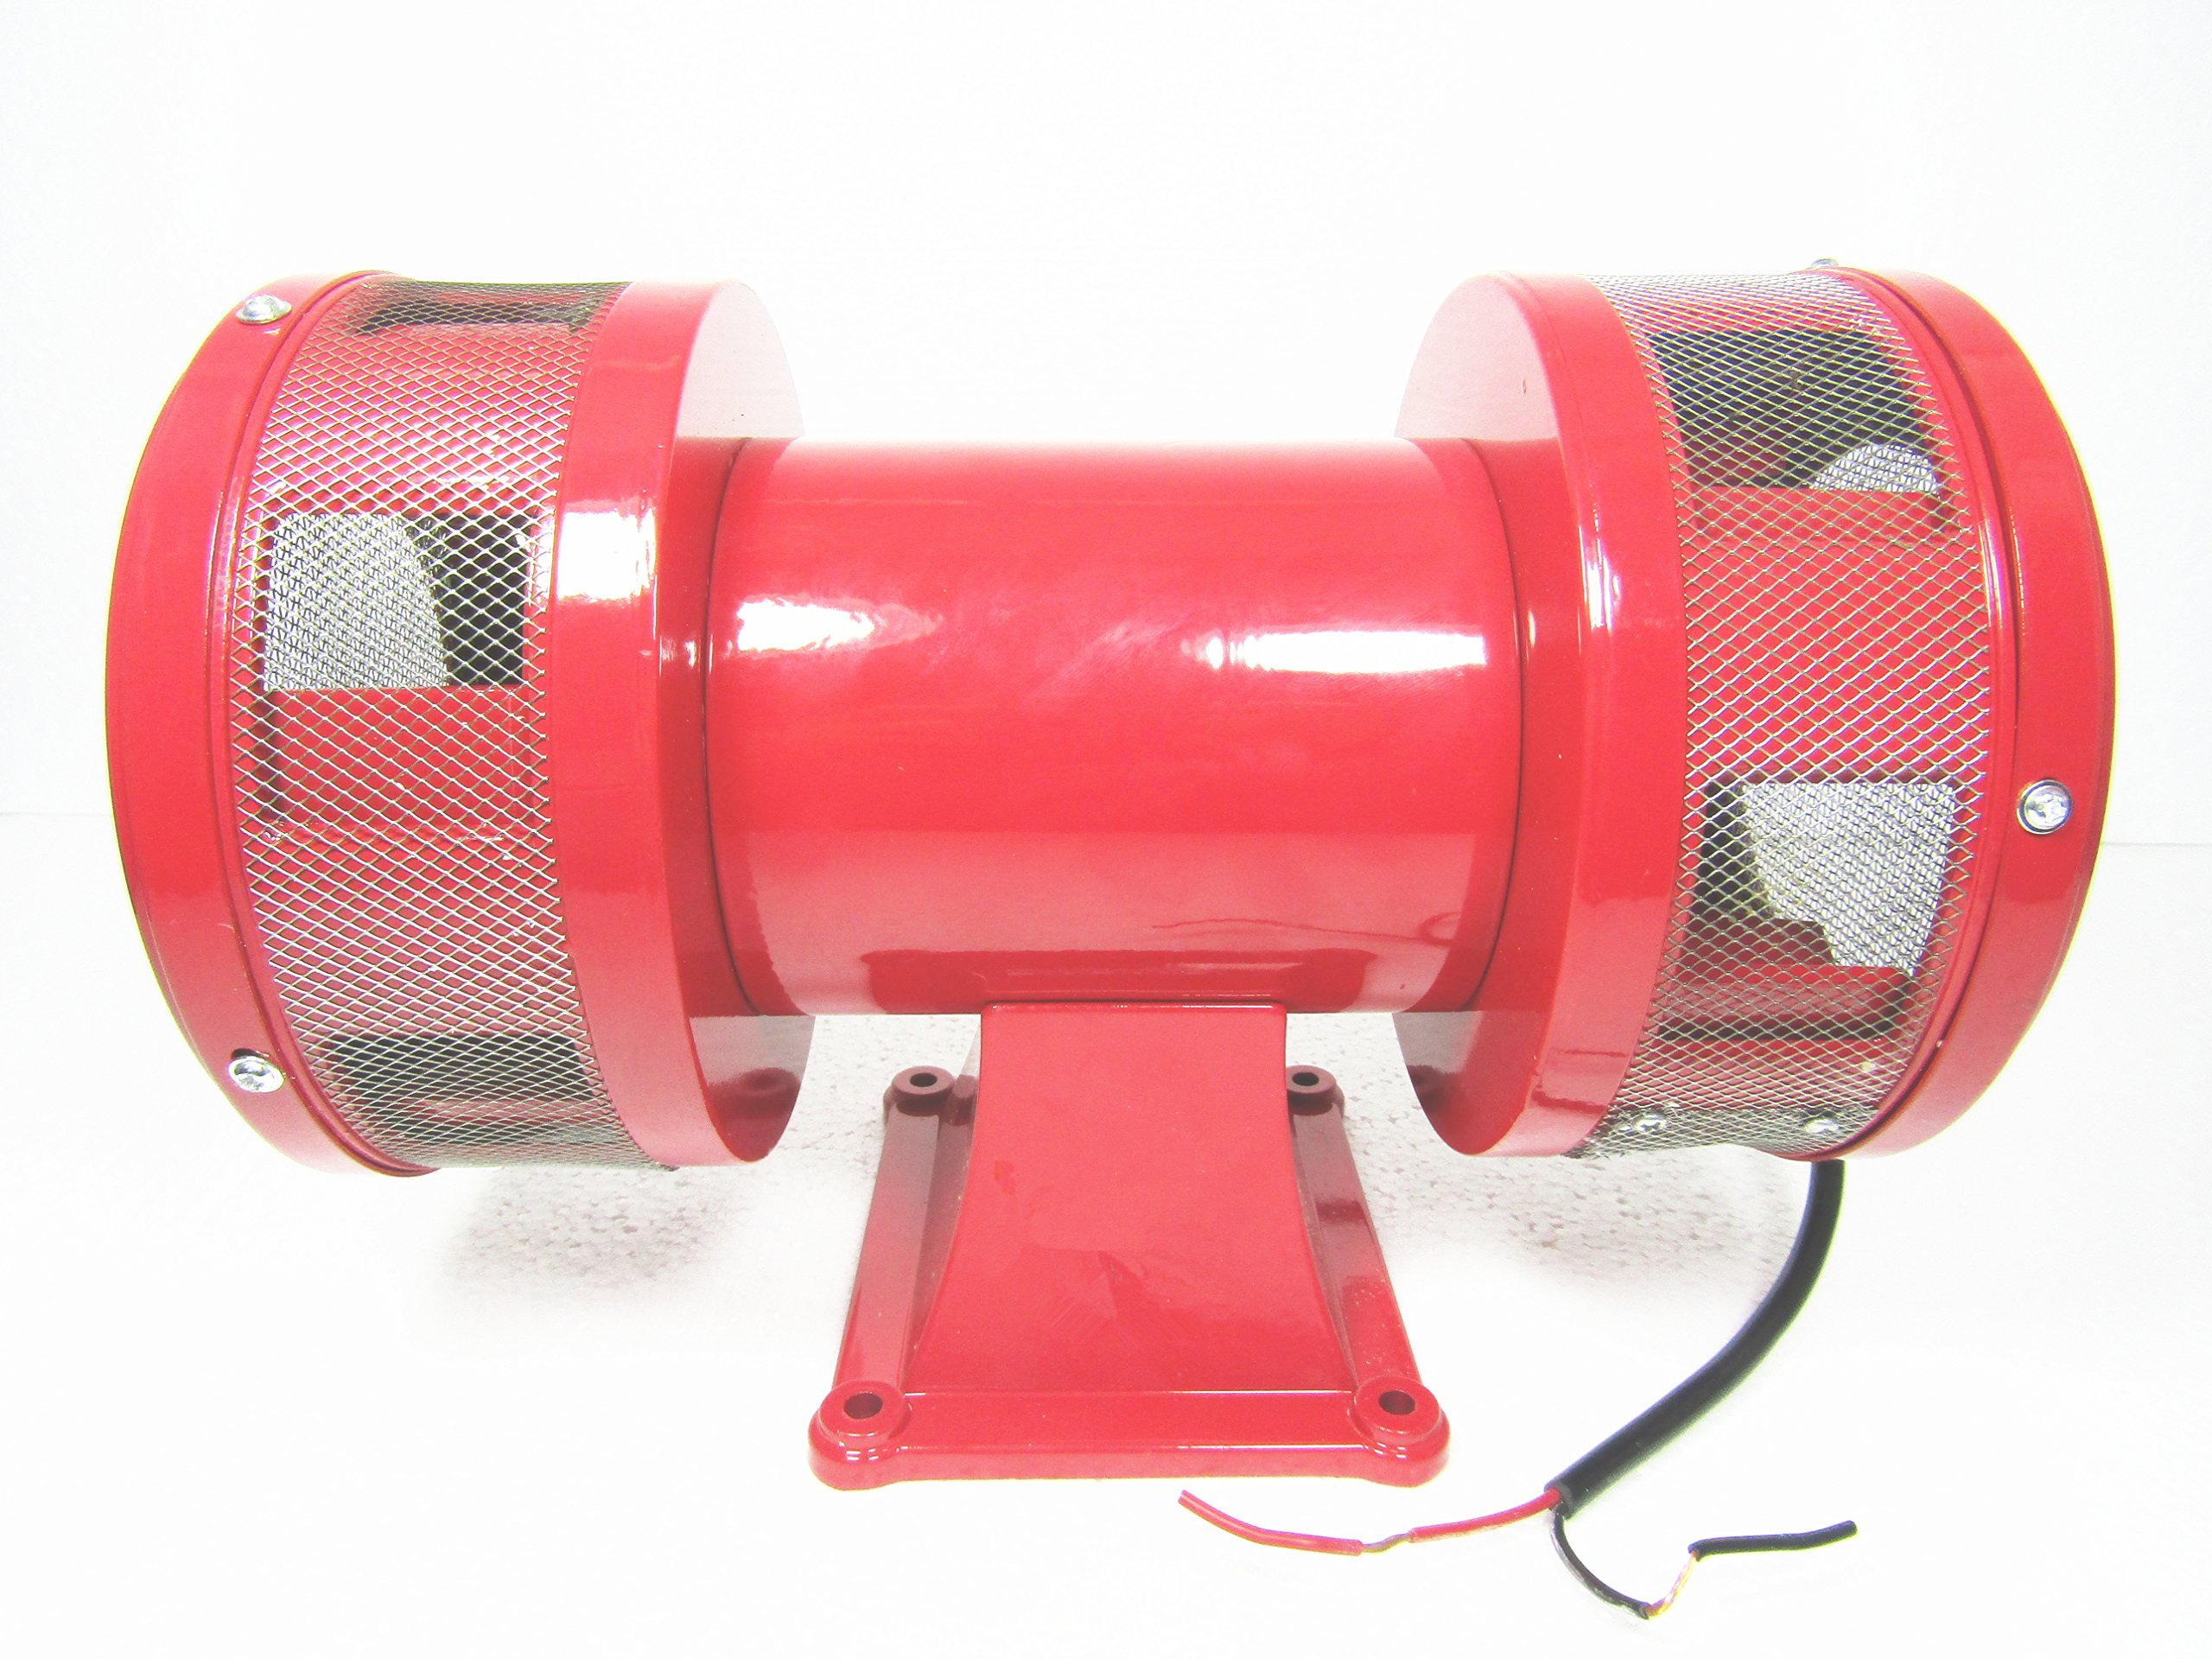 150db AC220V Air Raid Siren Bidirectional Horn Mine Boat Alarm Motor Driven Alarm